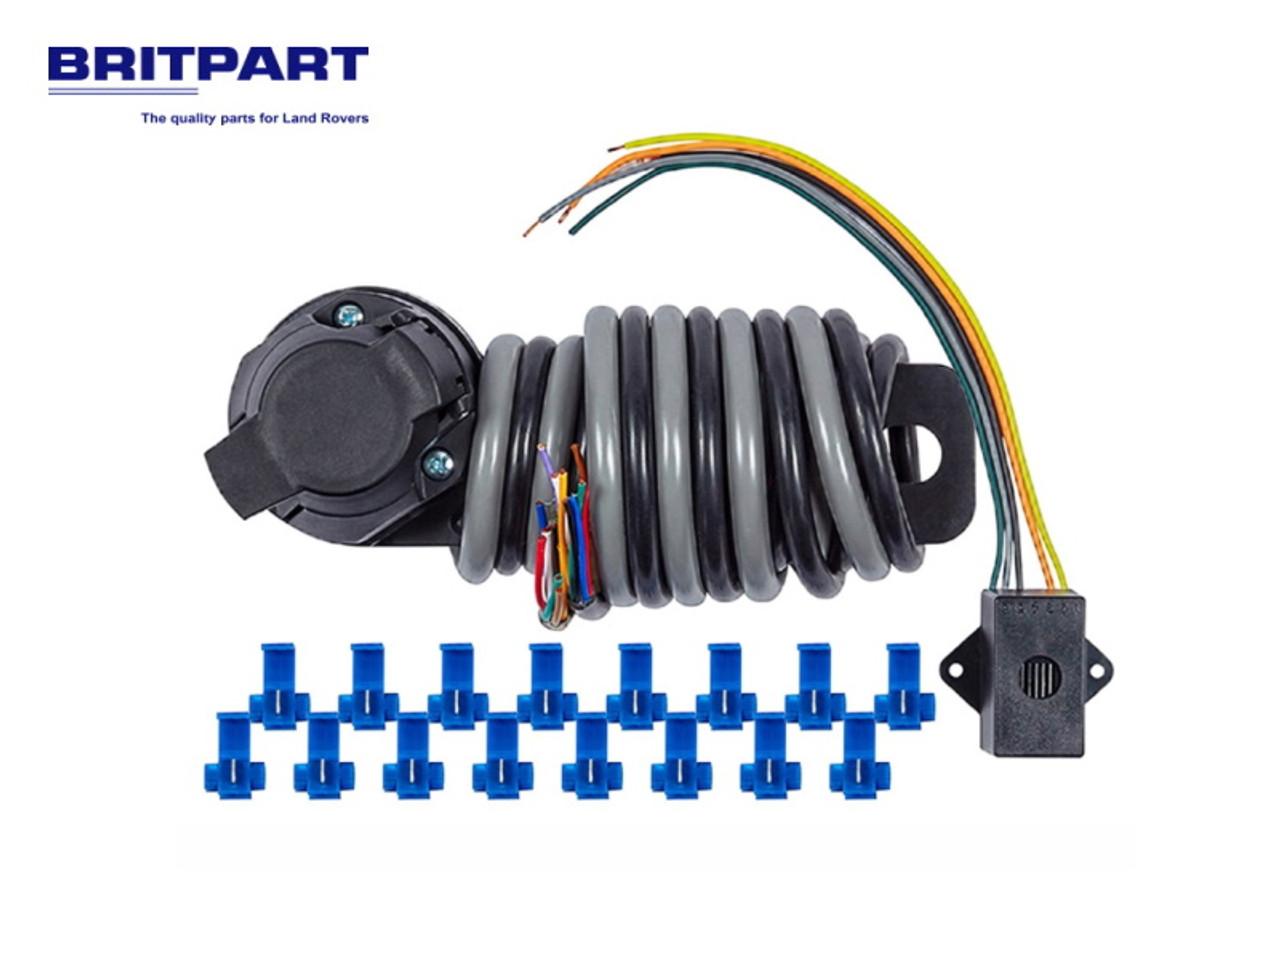 Britpart 13 Pin Universal Socket Assembly  - DA1882